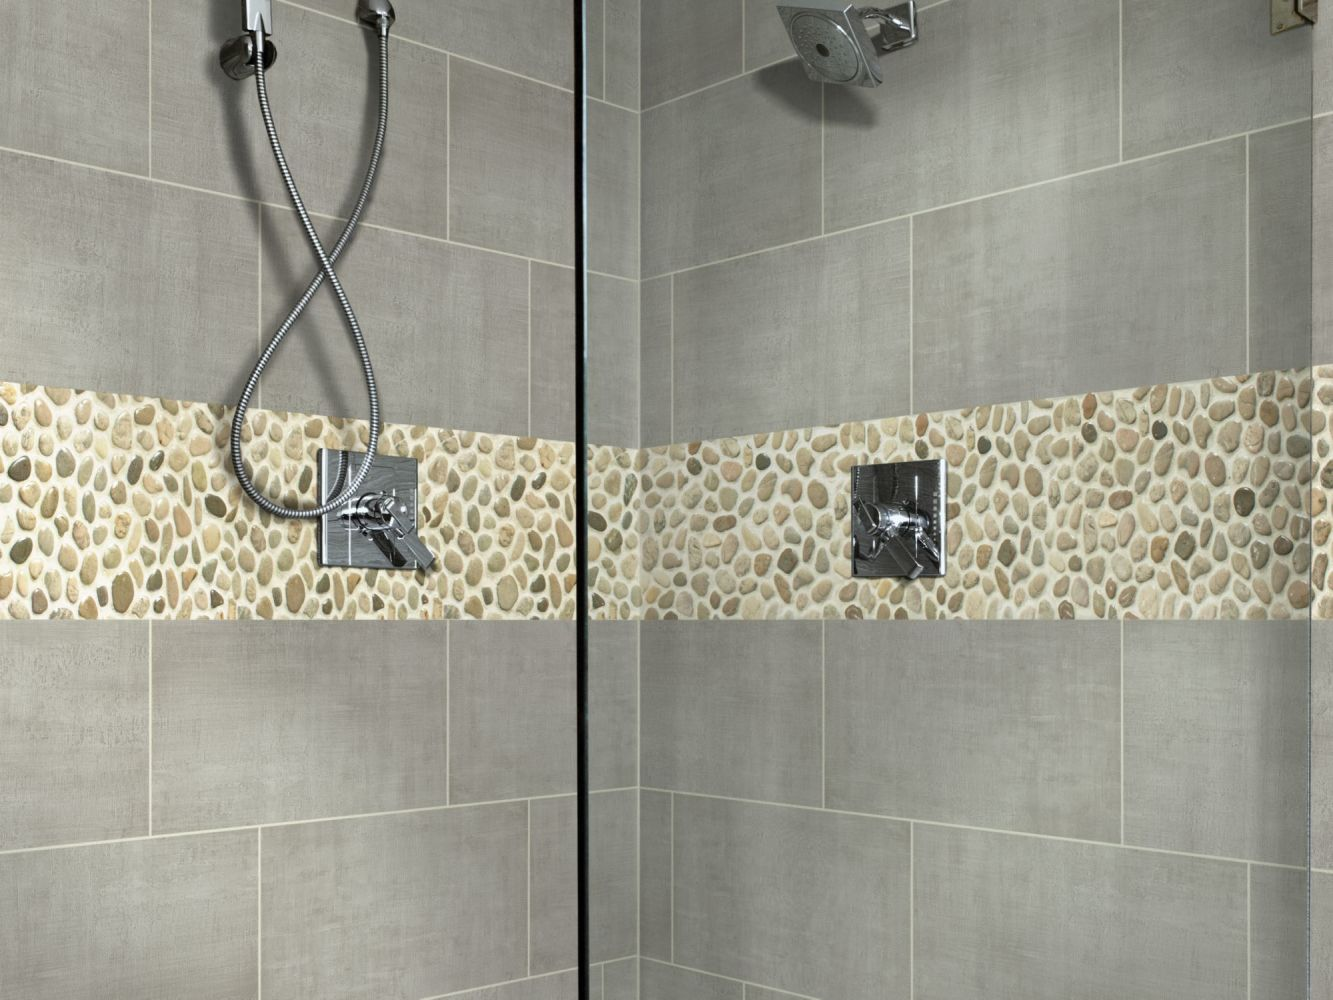 Shaw Floors Toll Brothers Ceramics River Rock Honed Vitality Mica 00155_TLL65